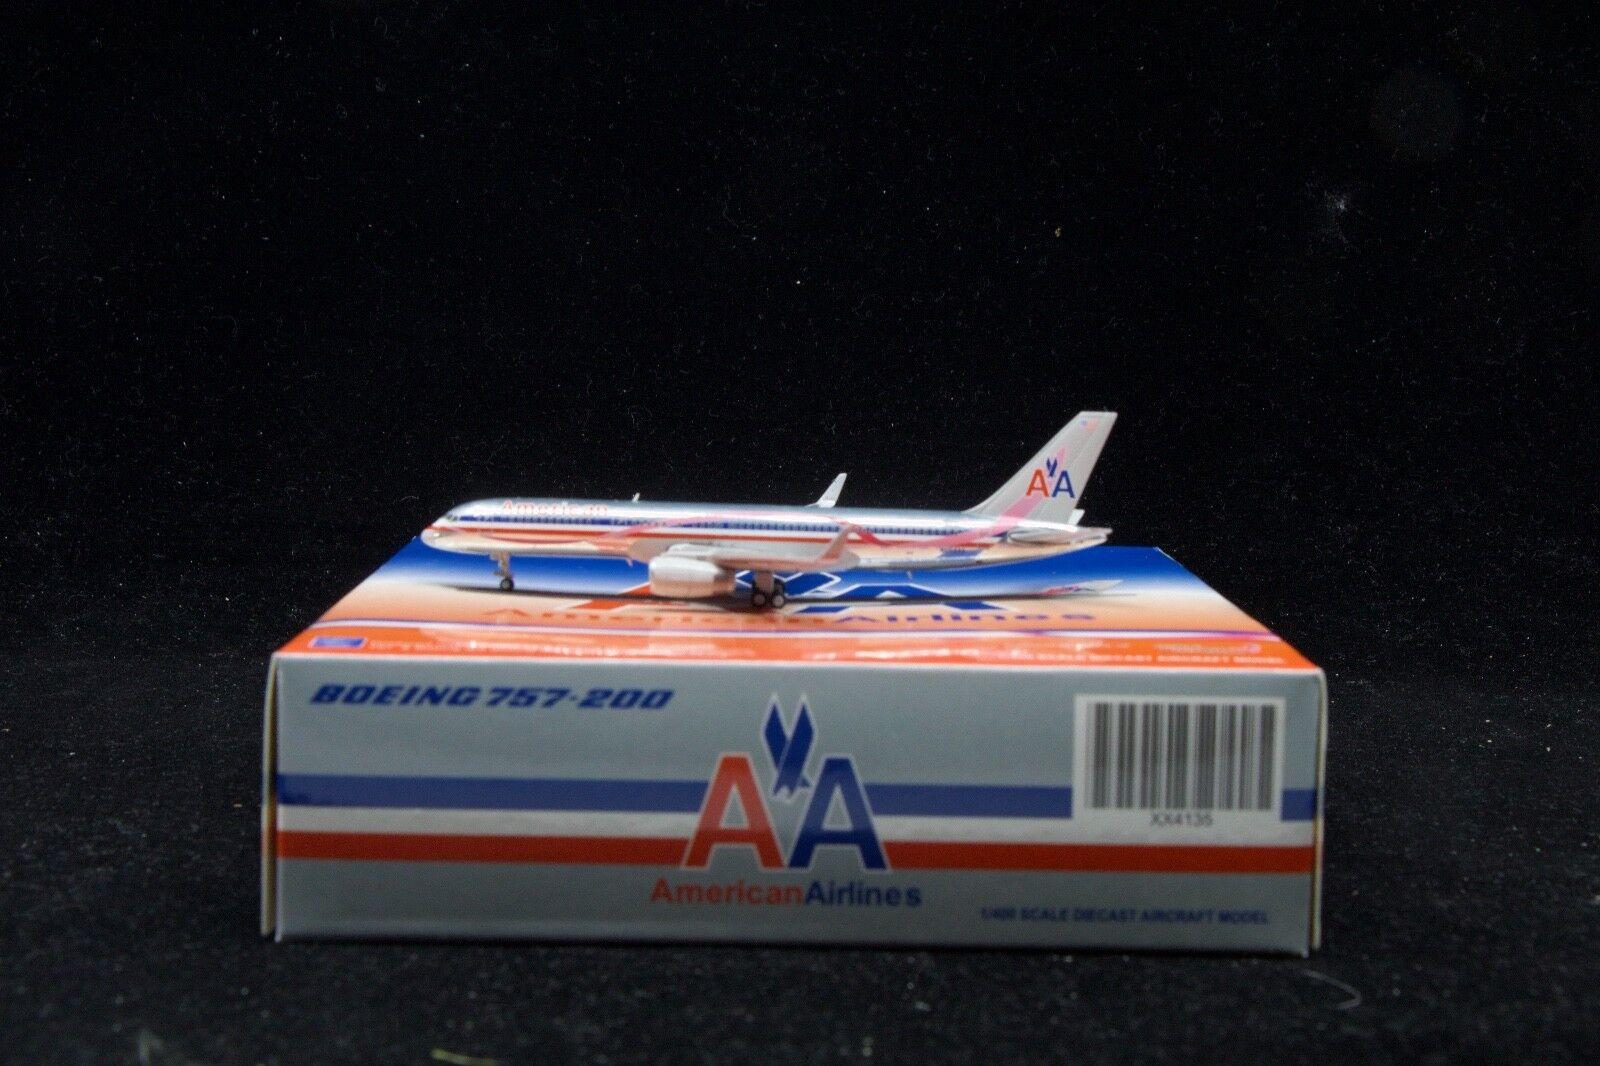 JC vinges 1  400 American Airlines Medvetenhet om bröstcancer 757 -200W N664AA